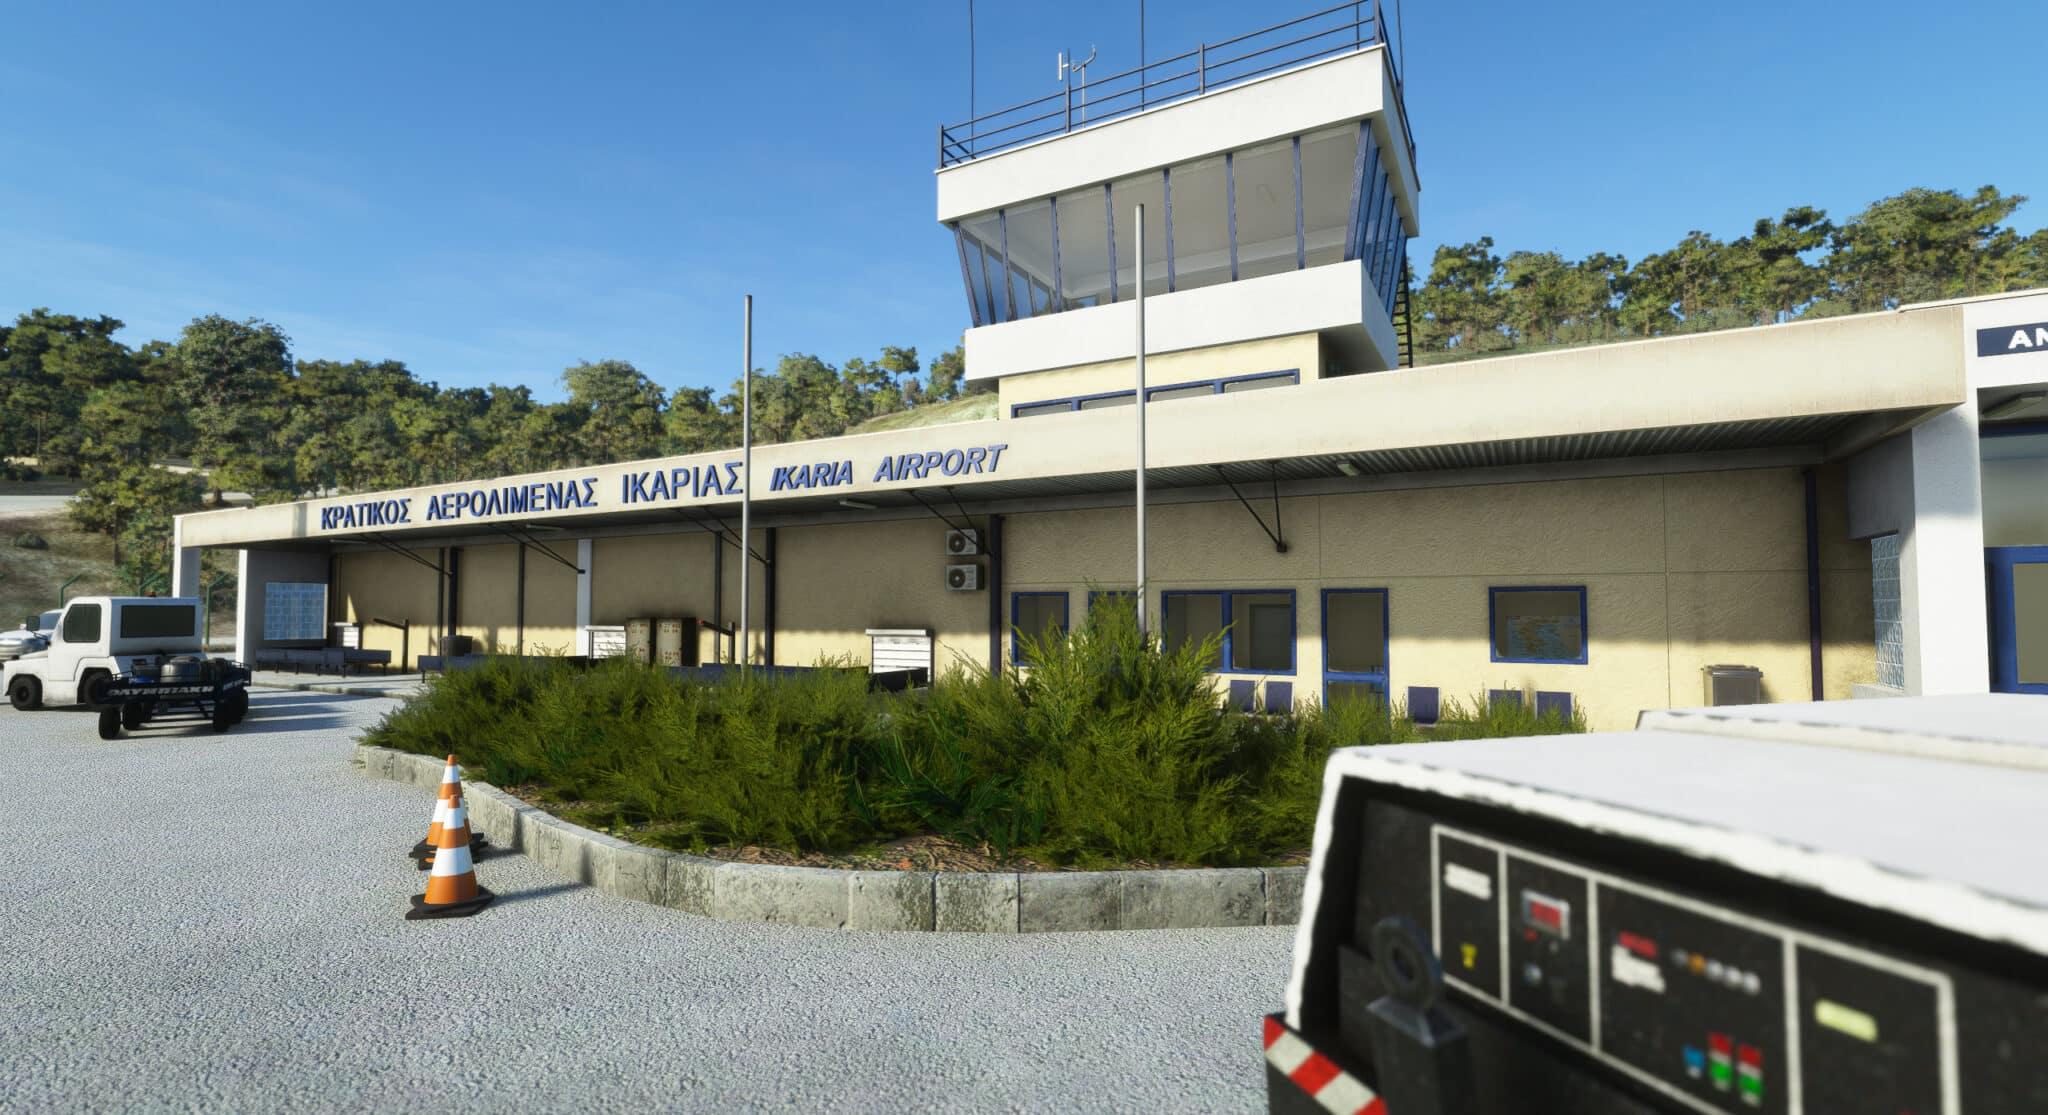 Terrainy Studios – Ikaria Airport MSFS